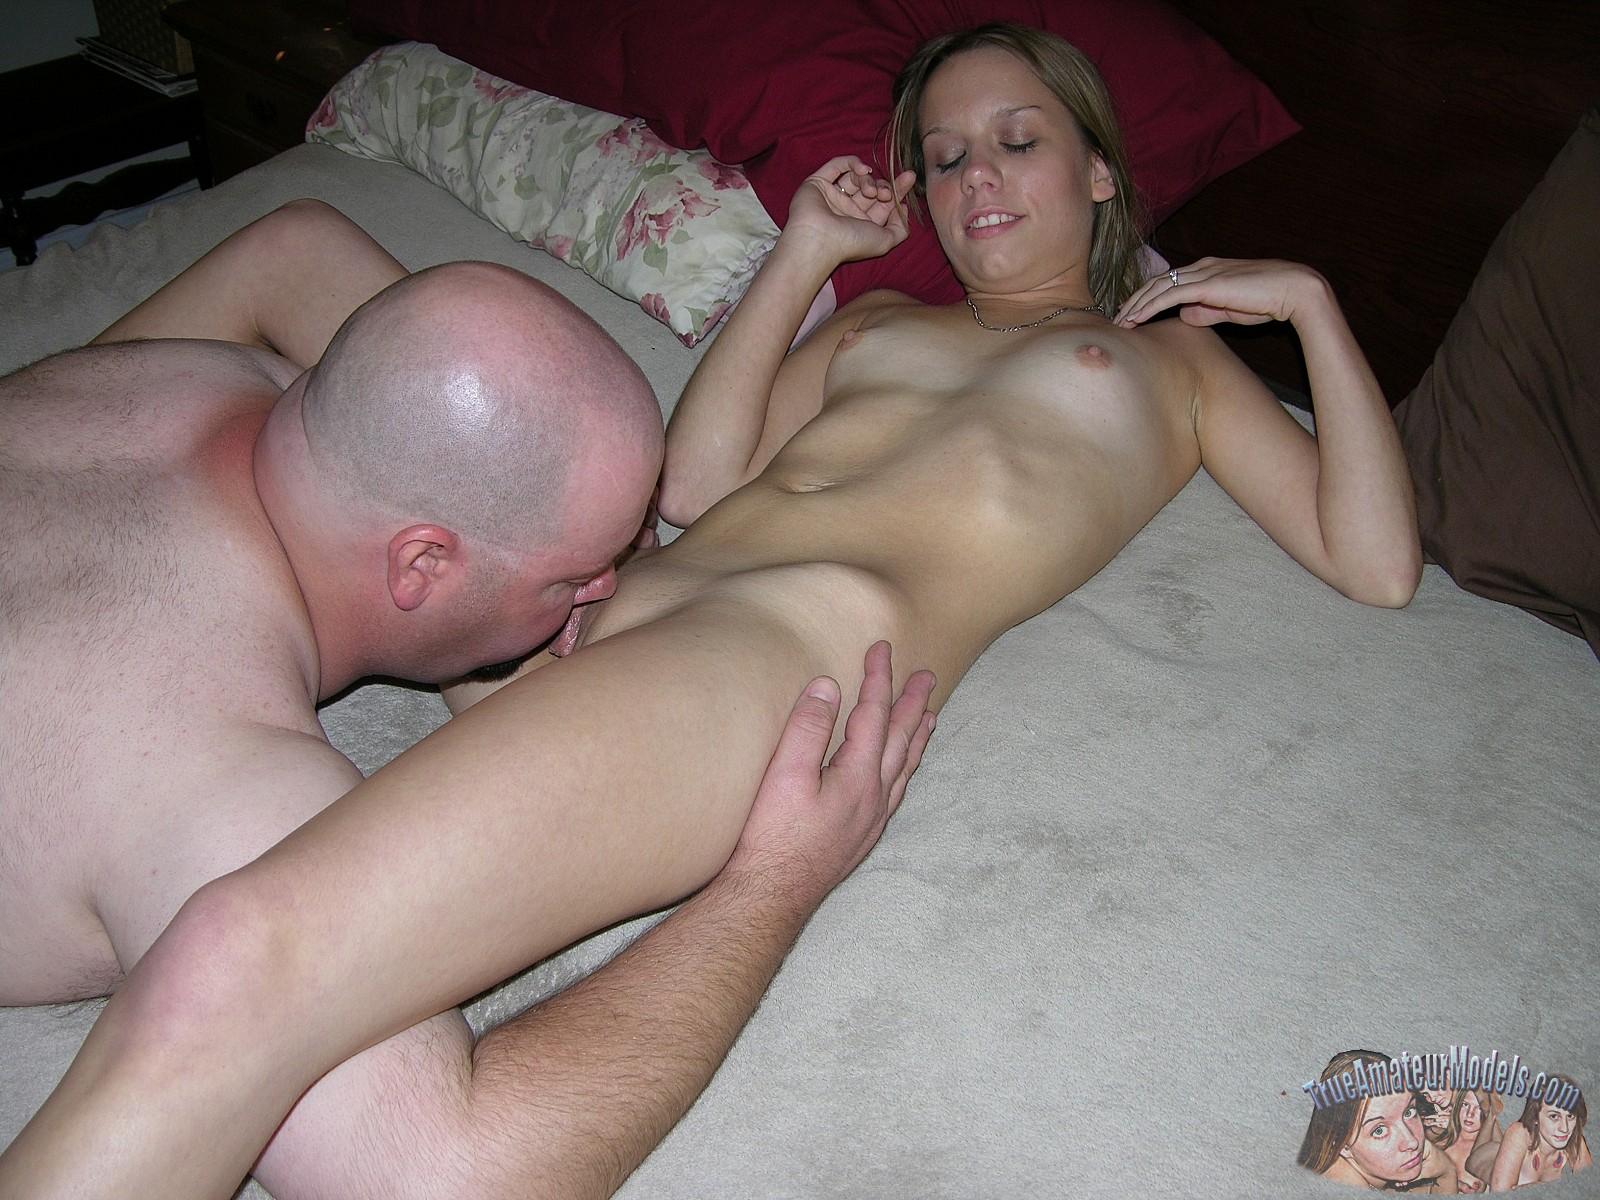 Gauge hot bitch crazy anal